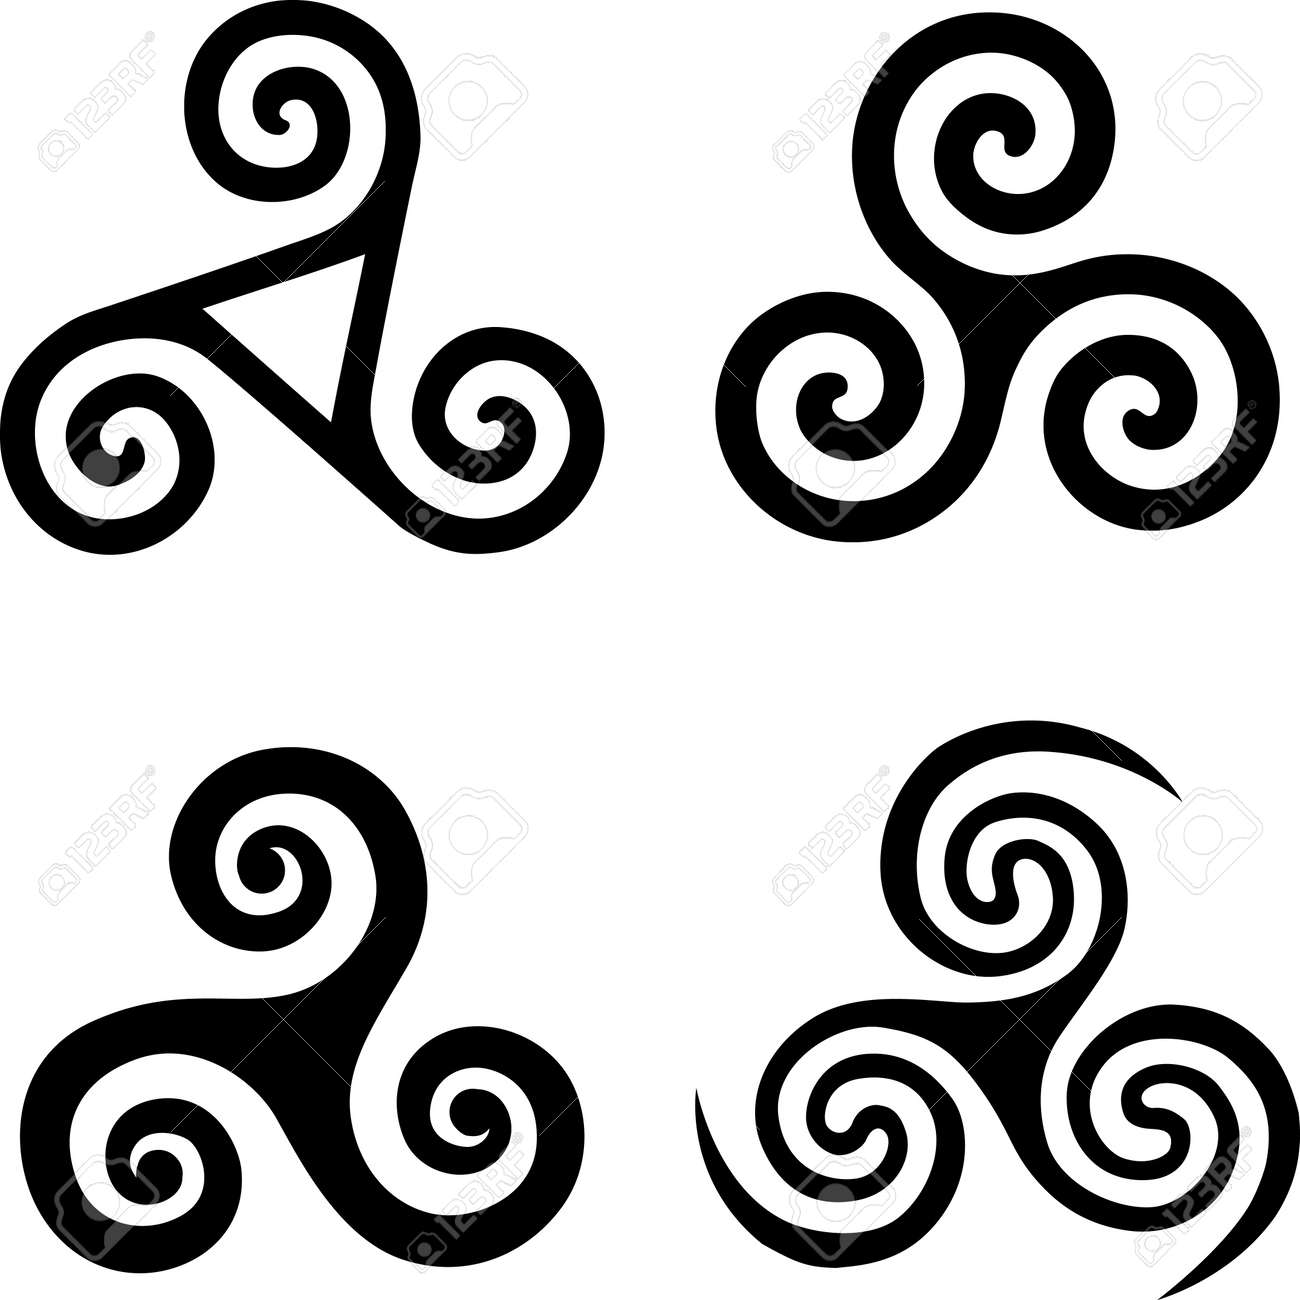 170 triskele stock vector illustration and royalty free triskele set of black isolated celtic symbols triskels illustration buycottarizona Images